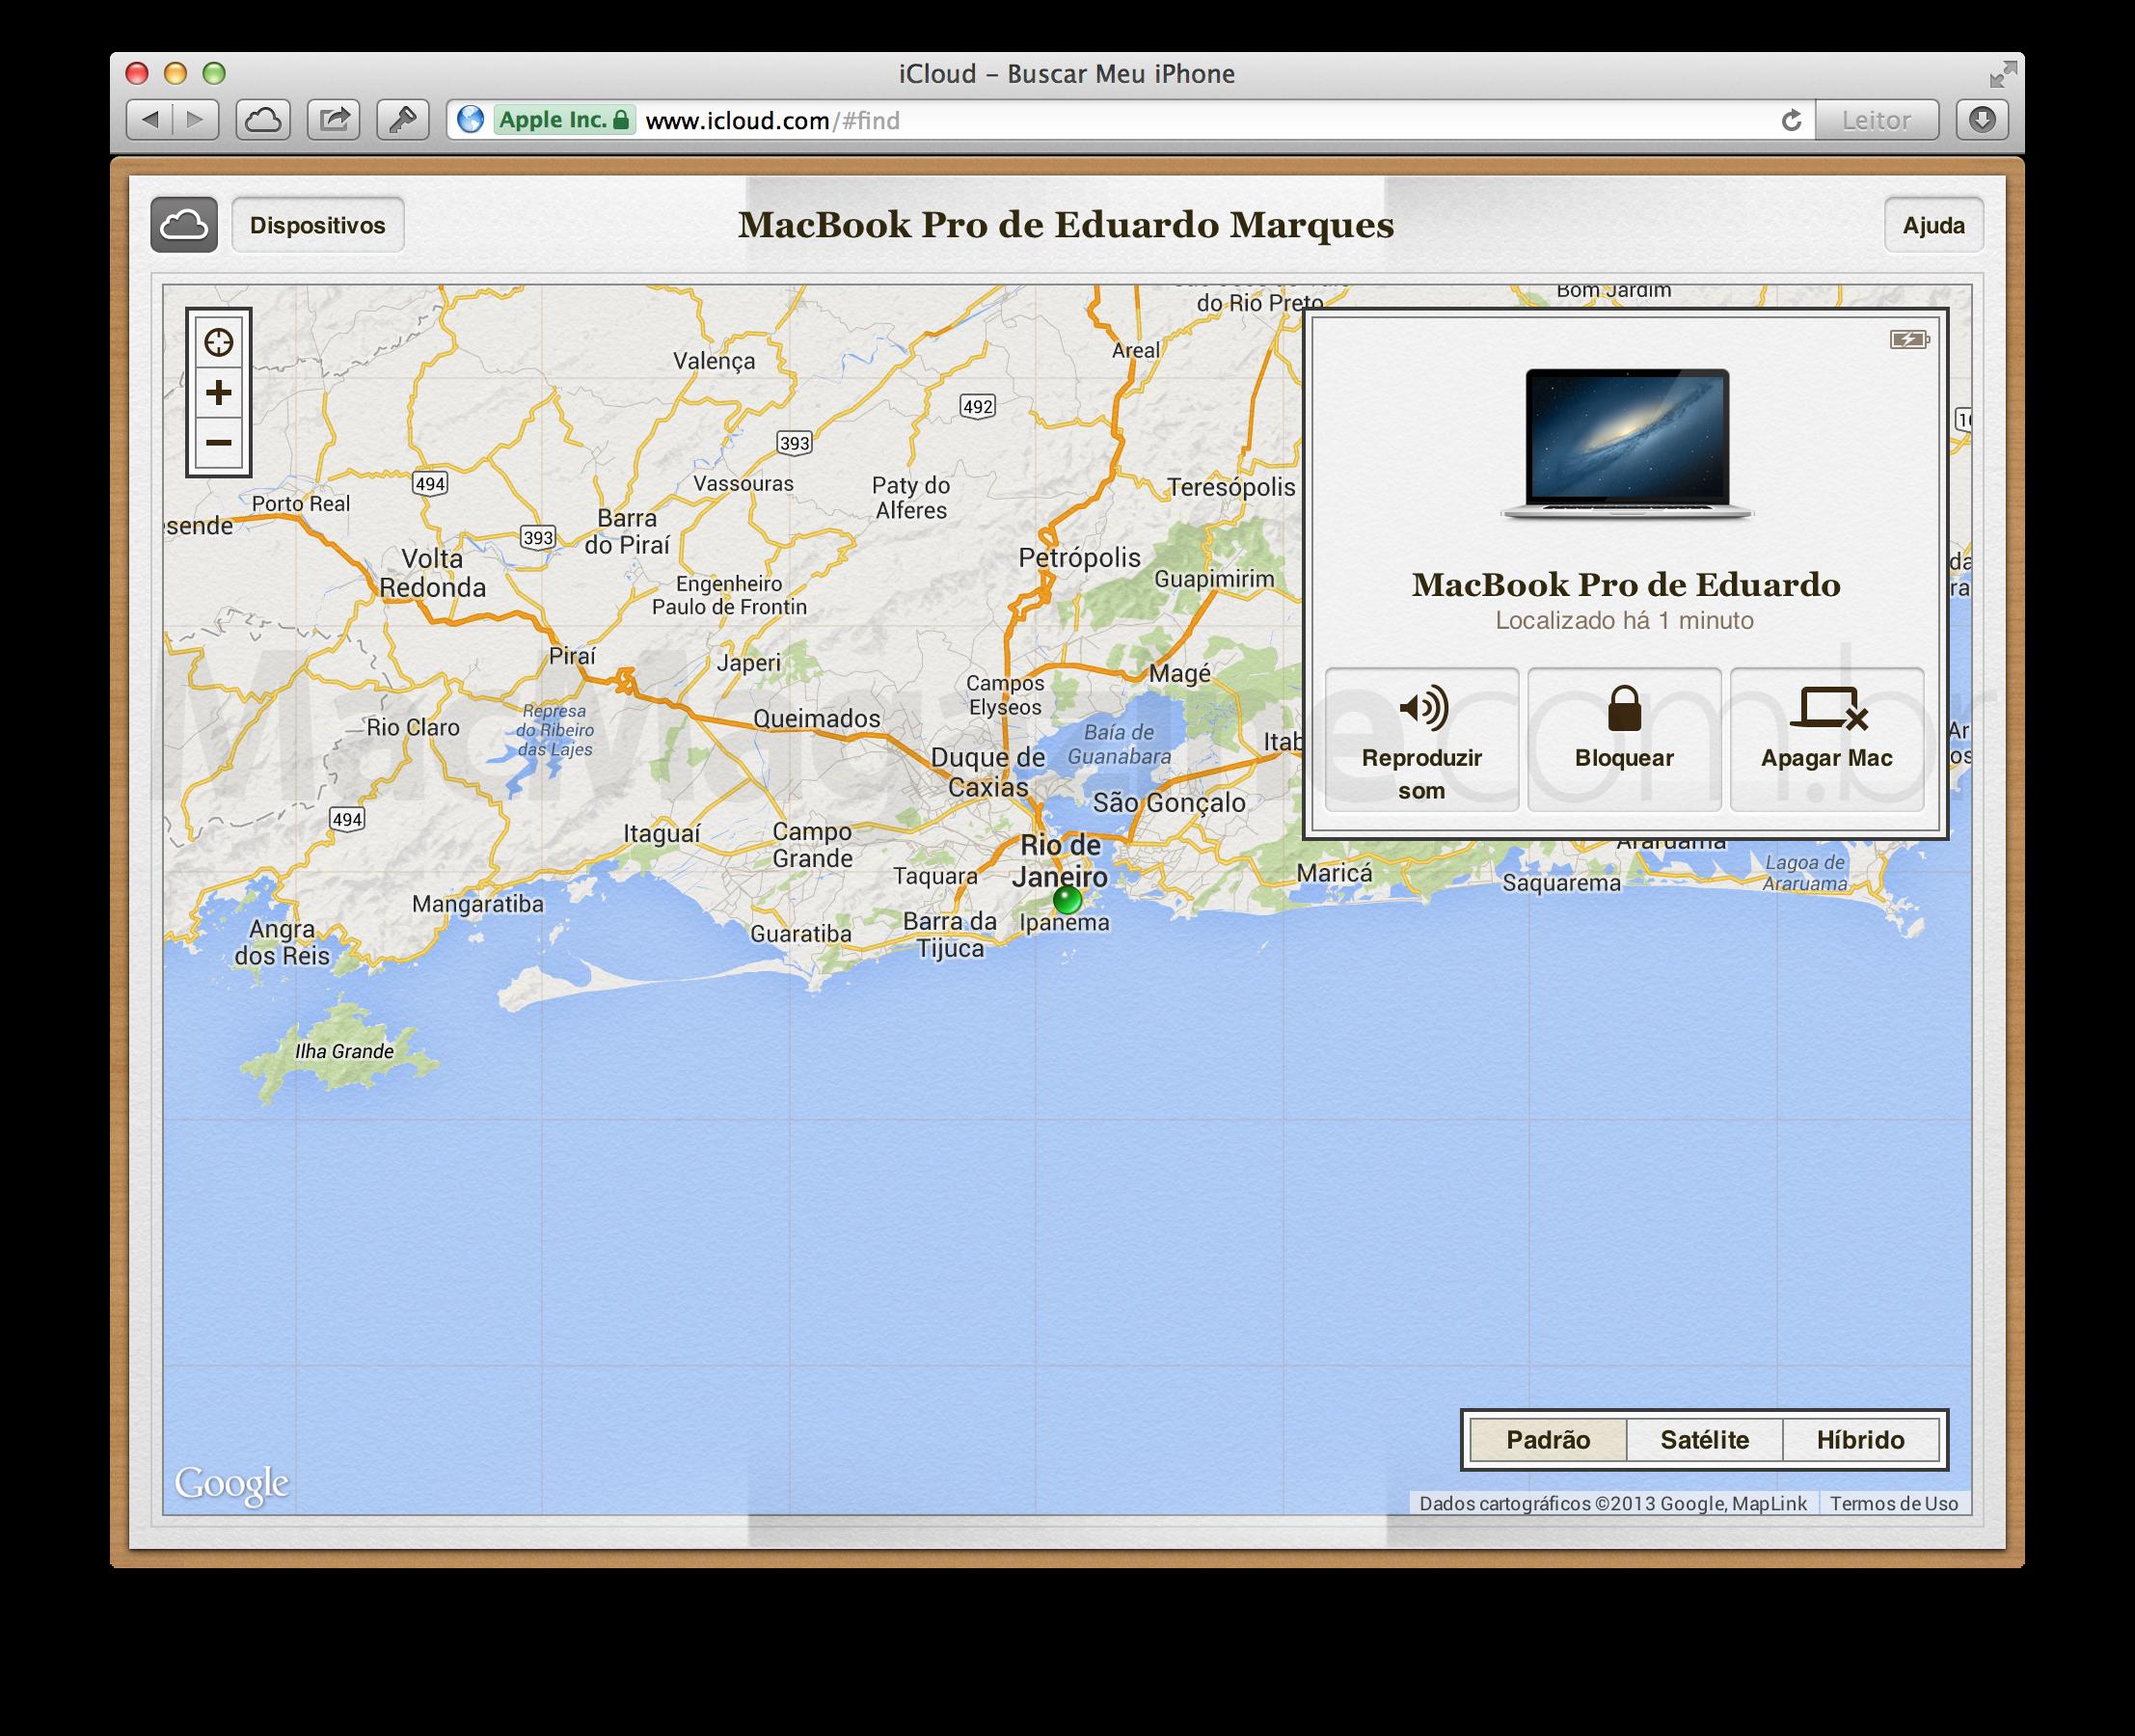 Buscar Meu Mac